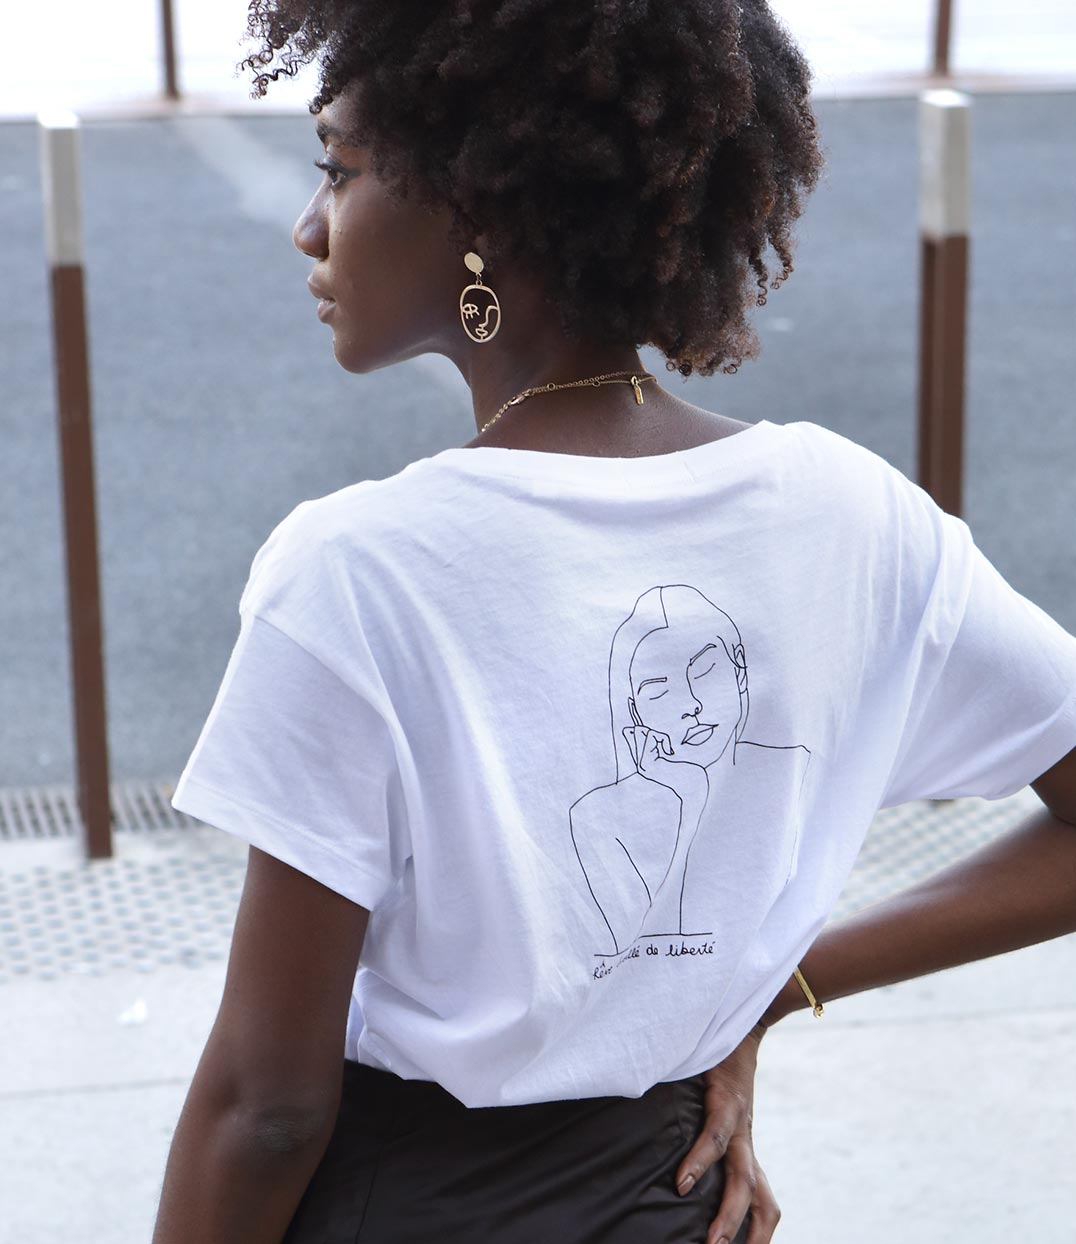 femme afro portant un tshirt blanc avec dessin de dos themis leonor roversi